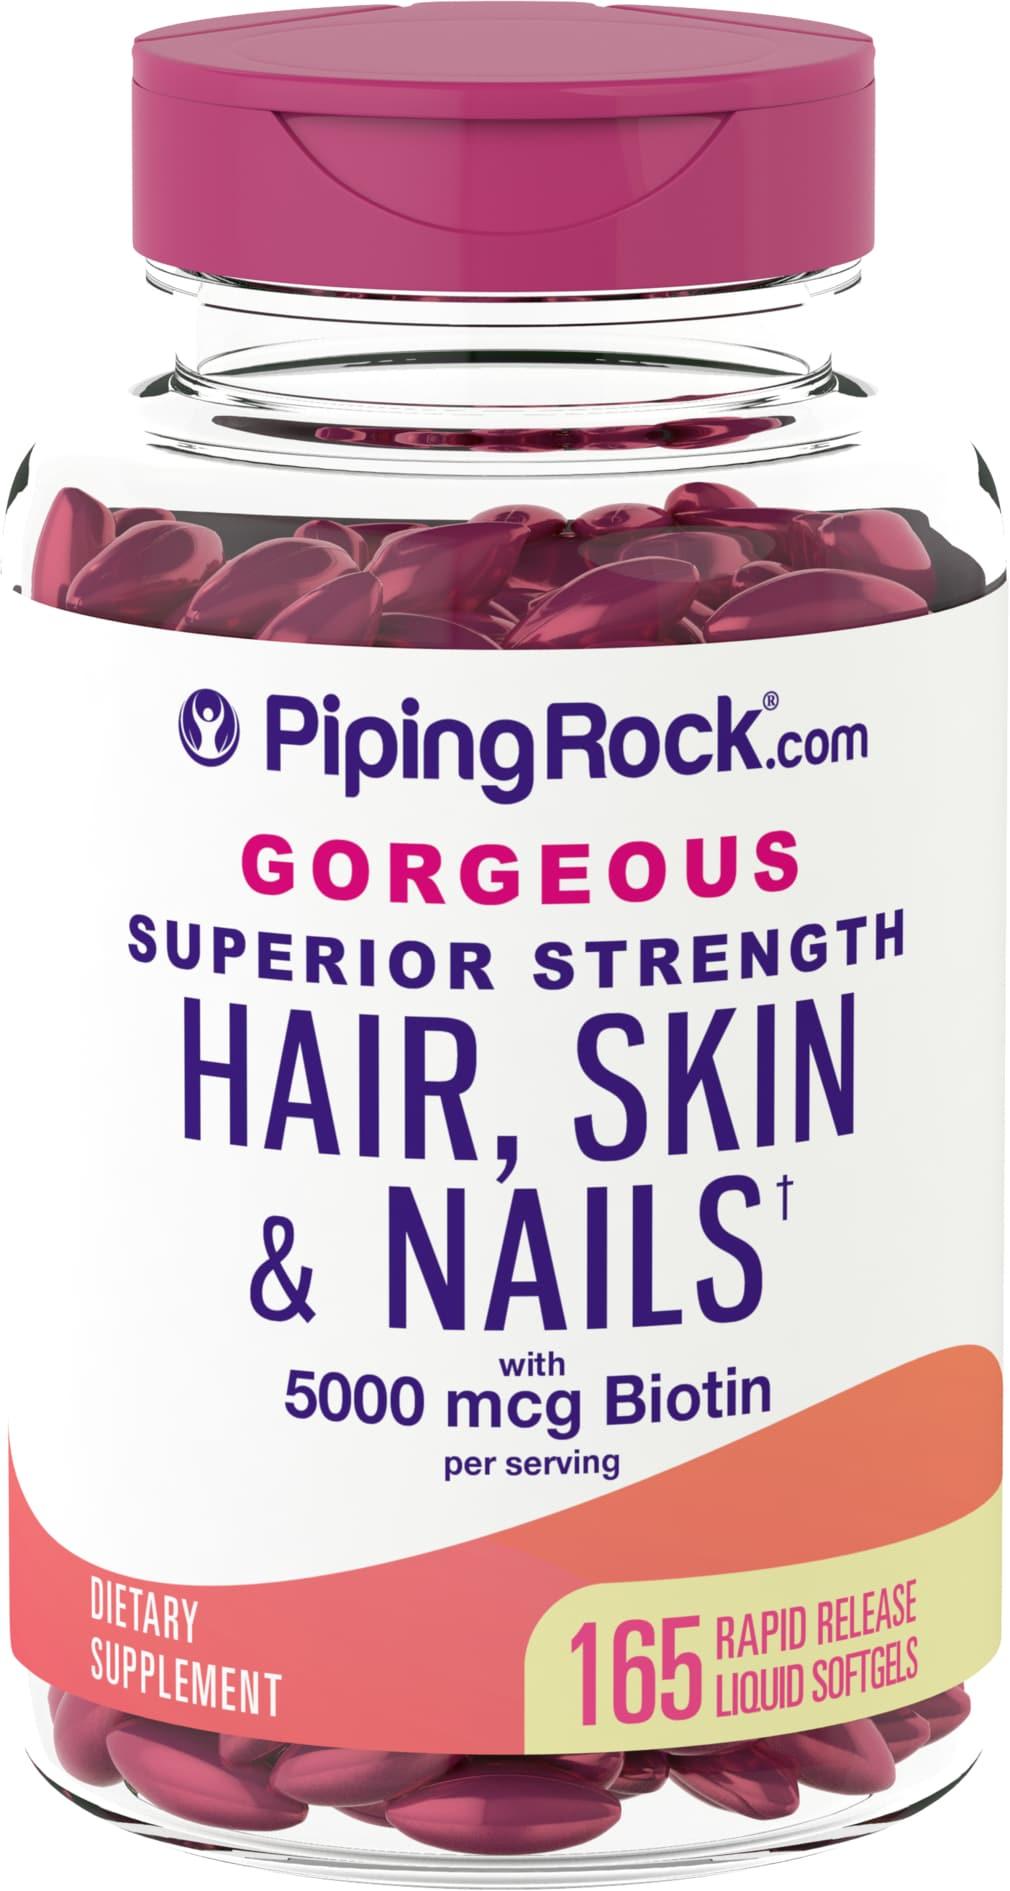 Hair skin nails supplement